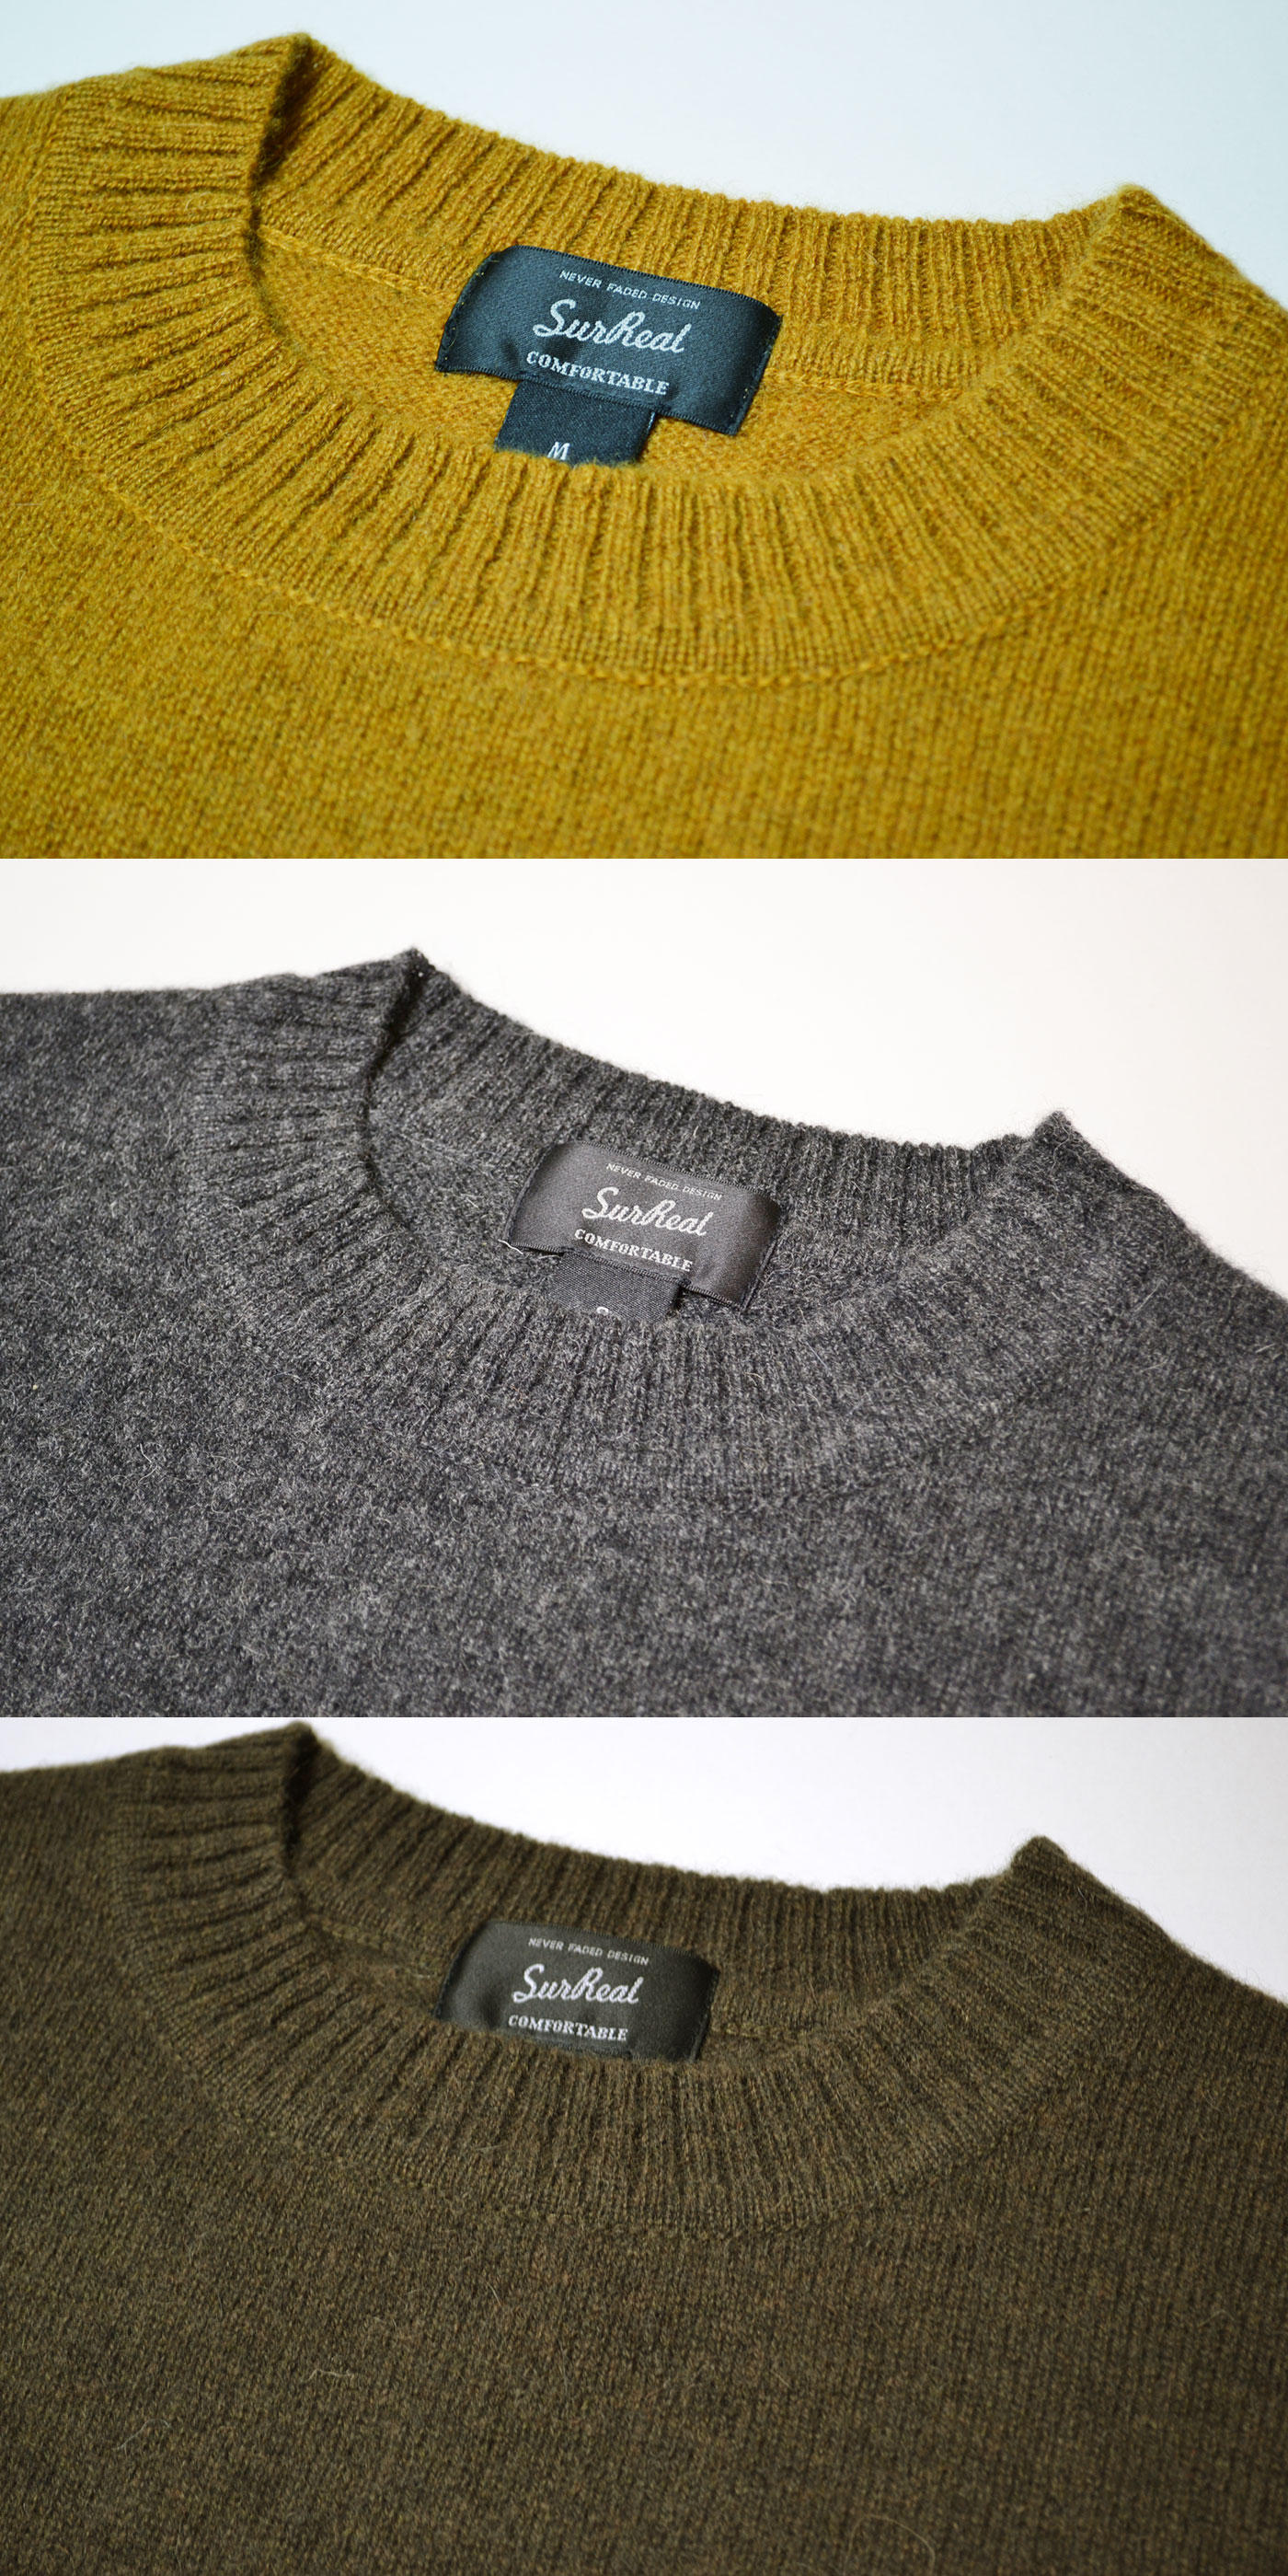 YASU シュルリアル シープスメア ウール セーター